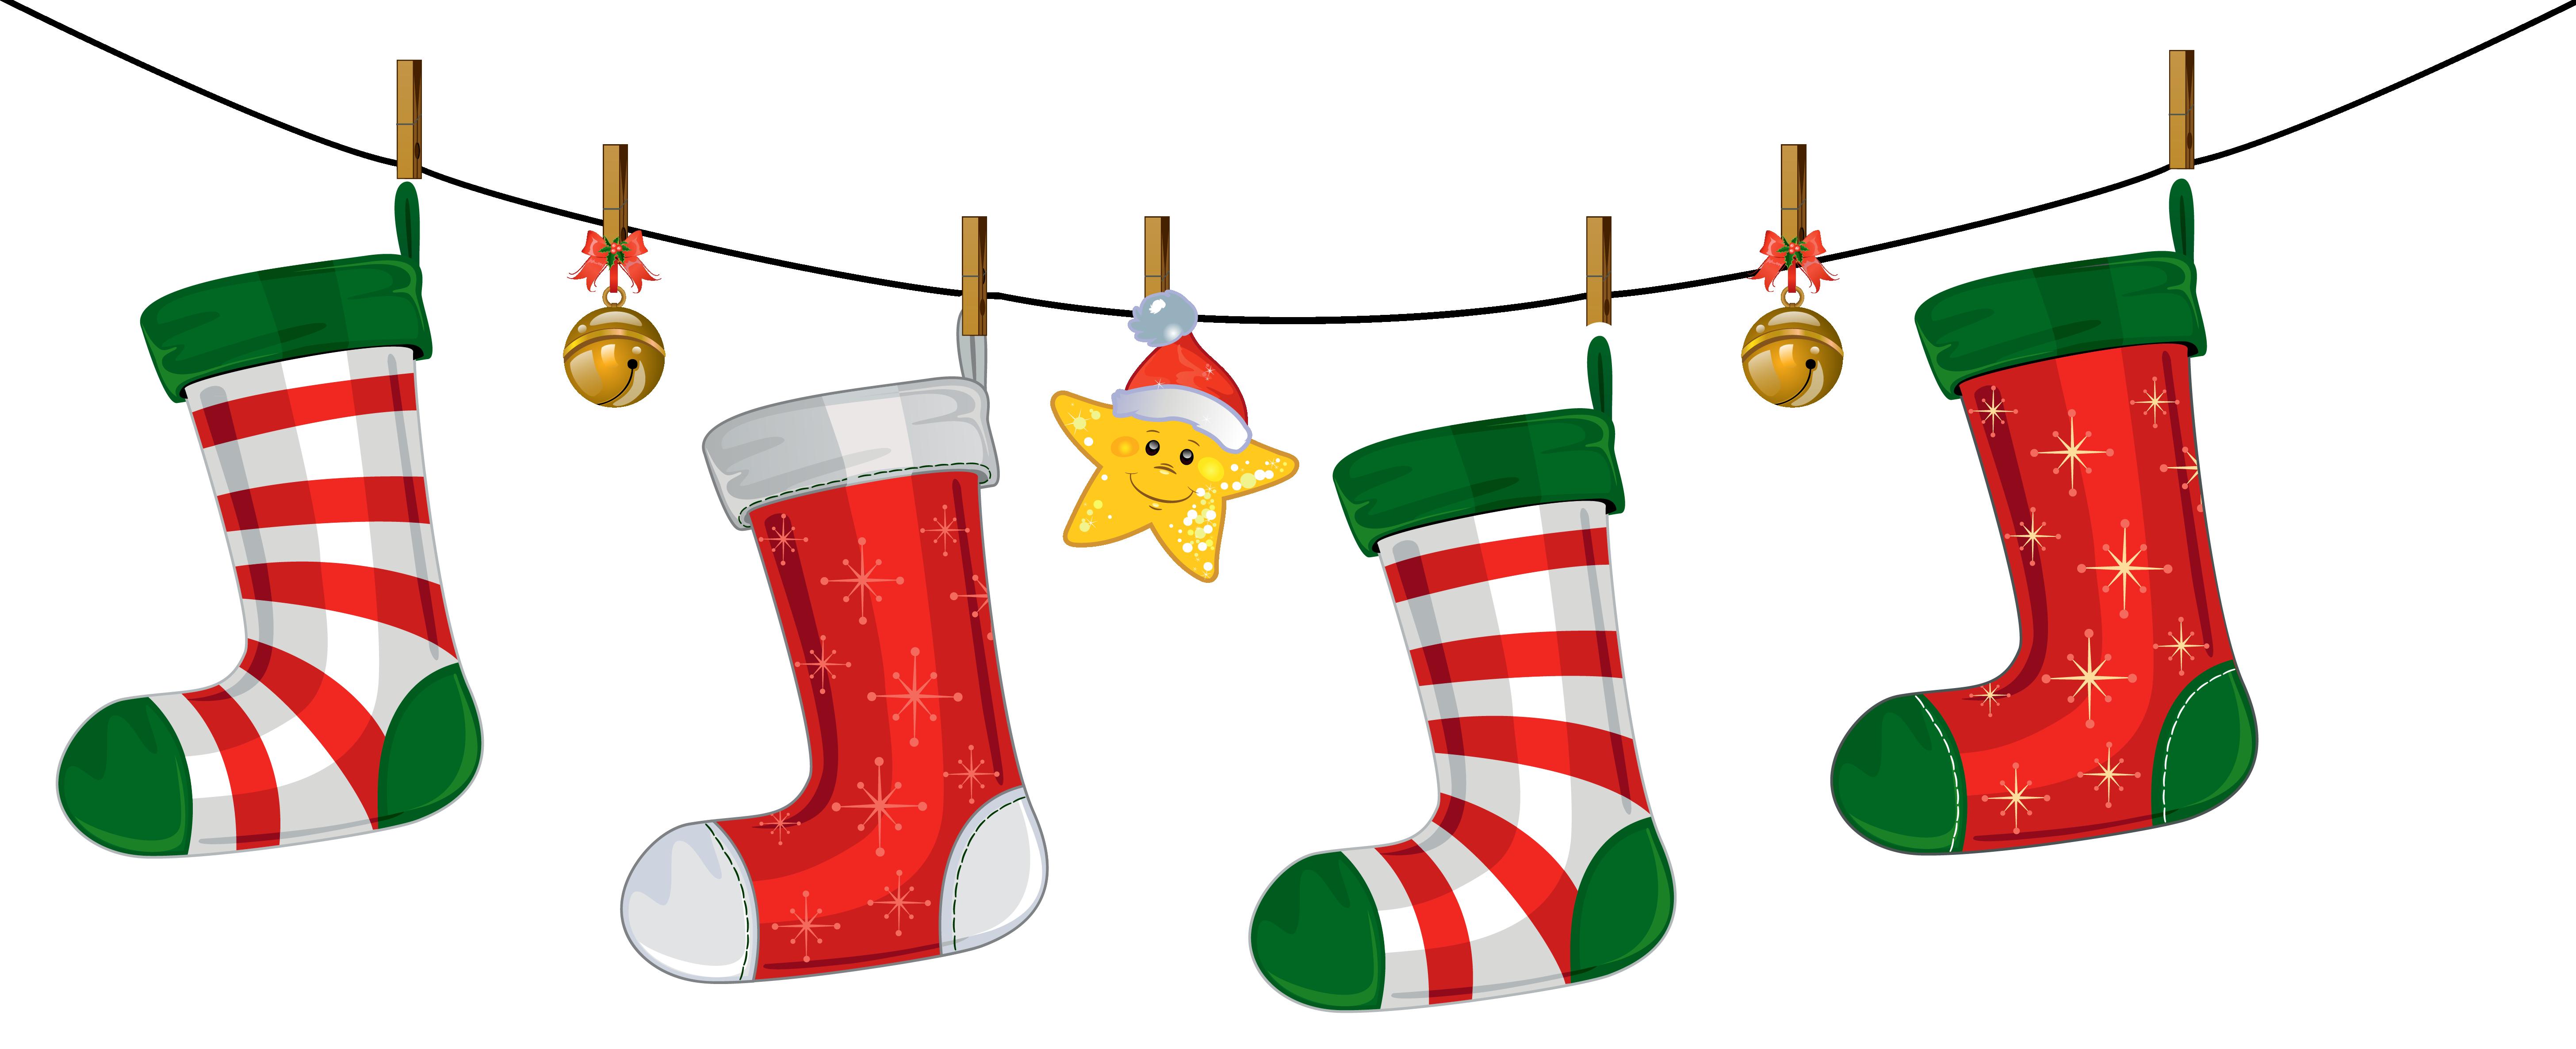 Transparent Christmas Stockings Decorati-Transparent Christmas Stockings Decoration Png Clipart Japoland-7